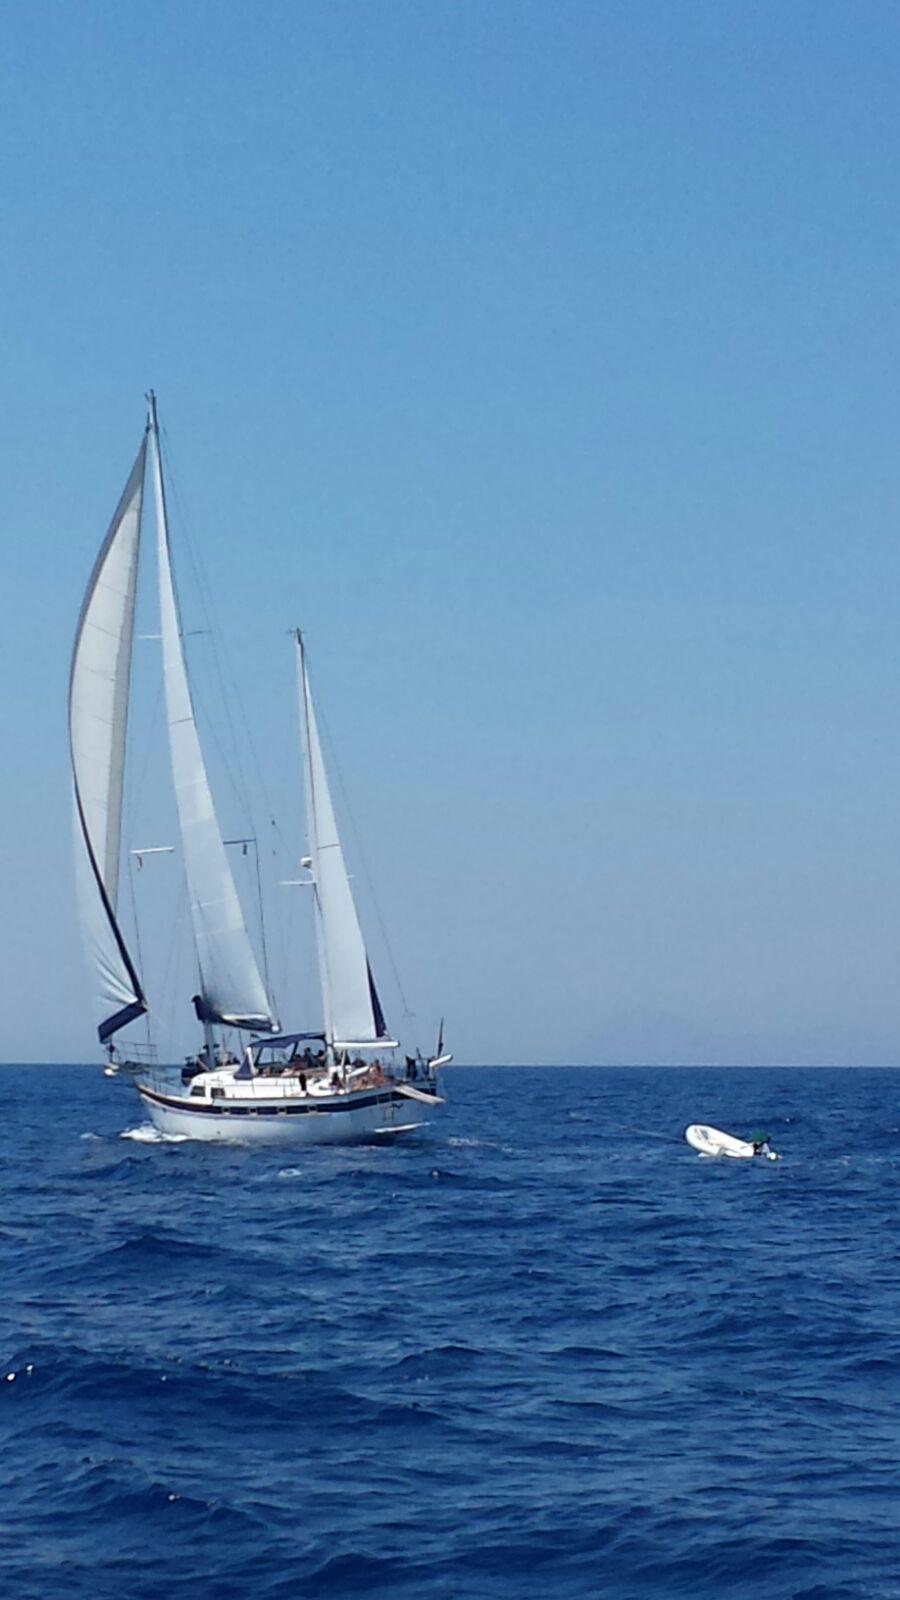 Magic - Sailing Yacht- Irwin Ketch 65'